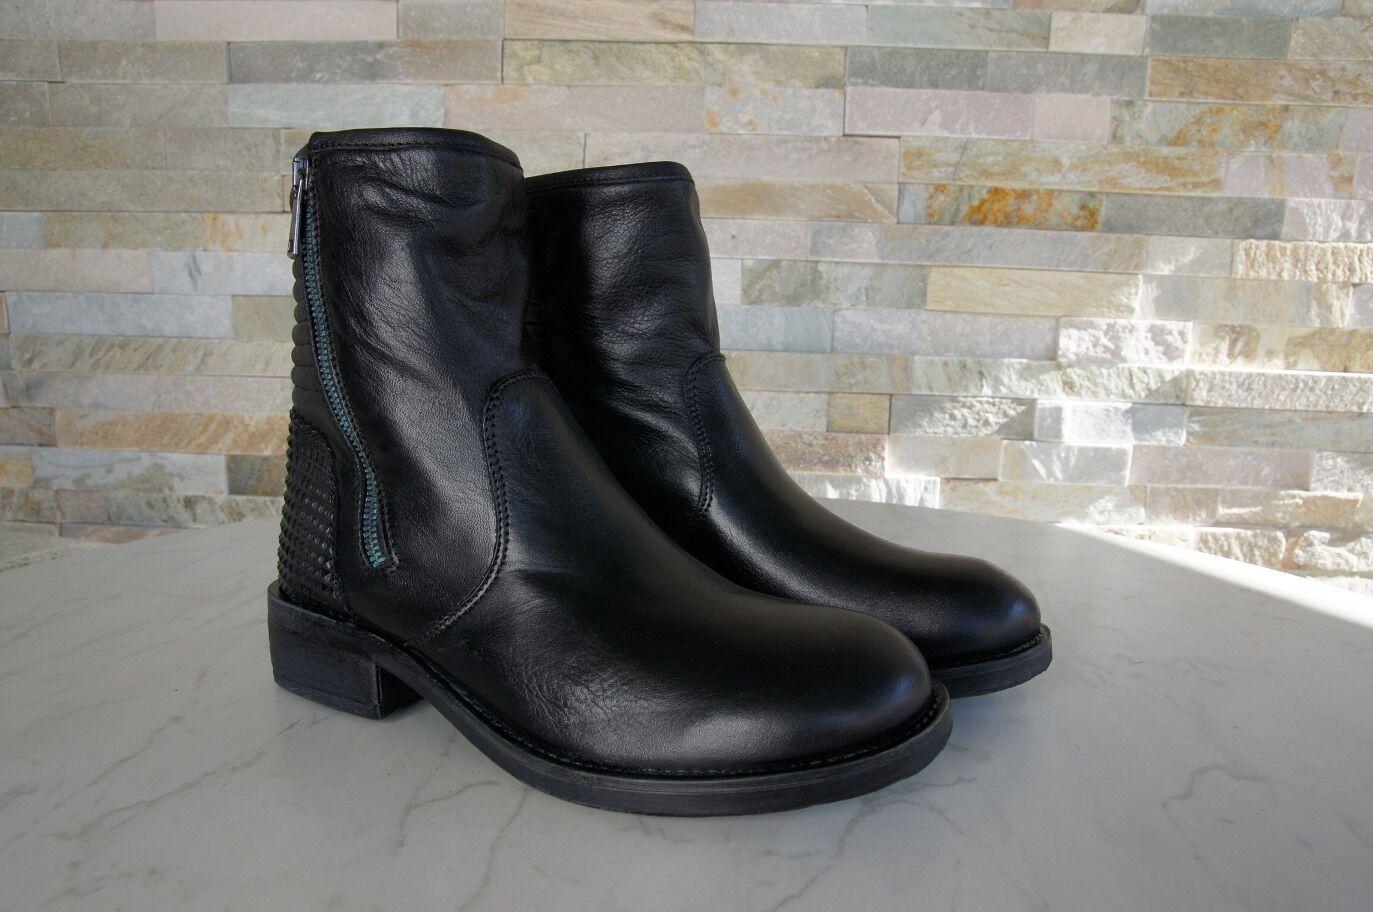 anna fidanza Gr 37 Stiefeletten Leder NEU Schuhe shoes schwarz nero NEU Leder 7d28c5